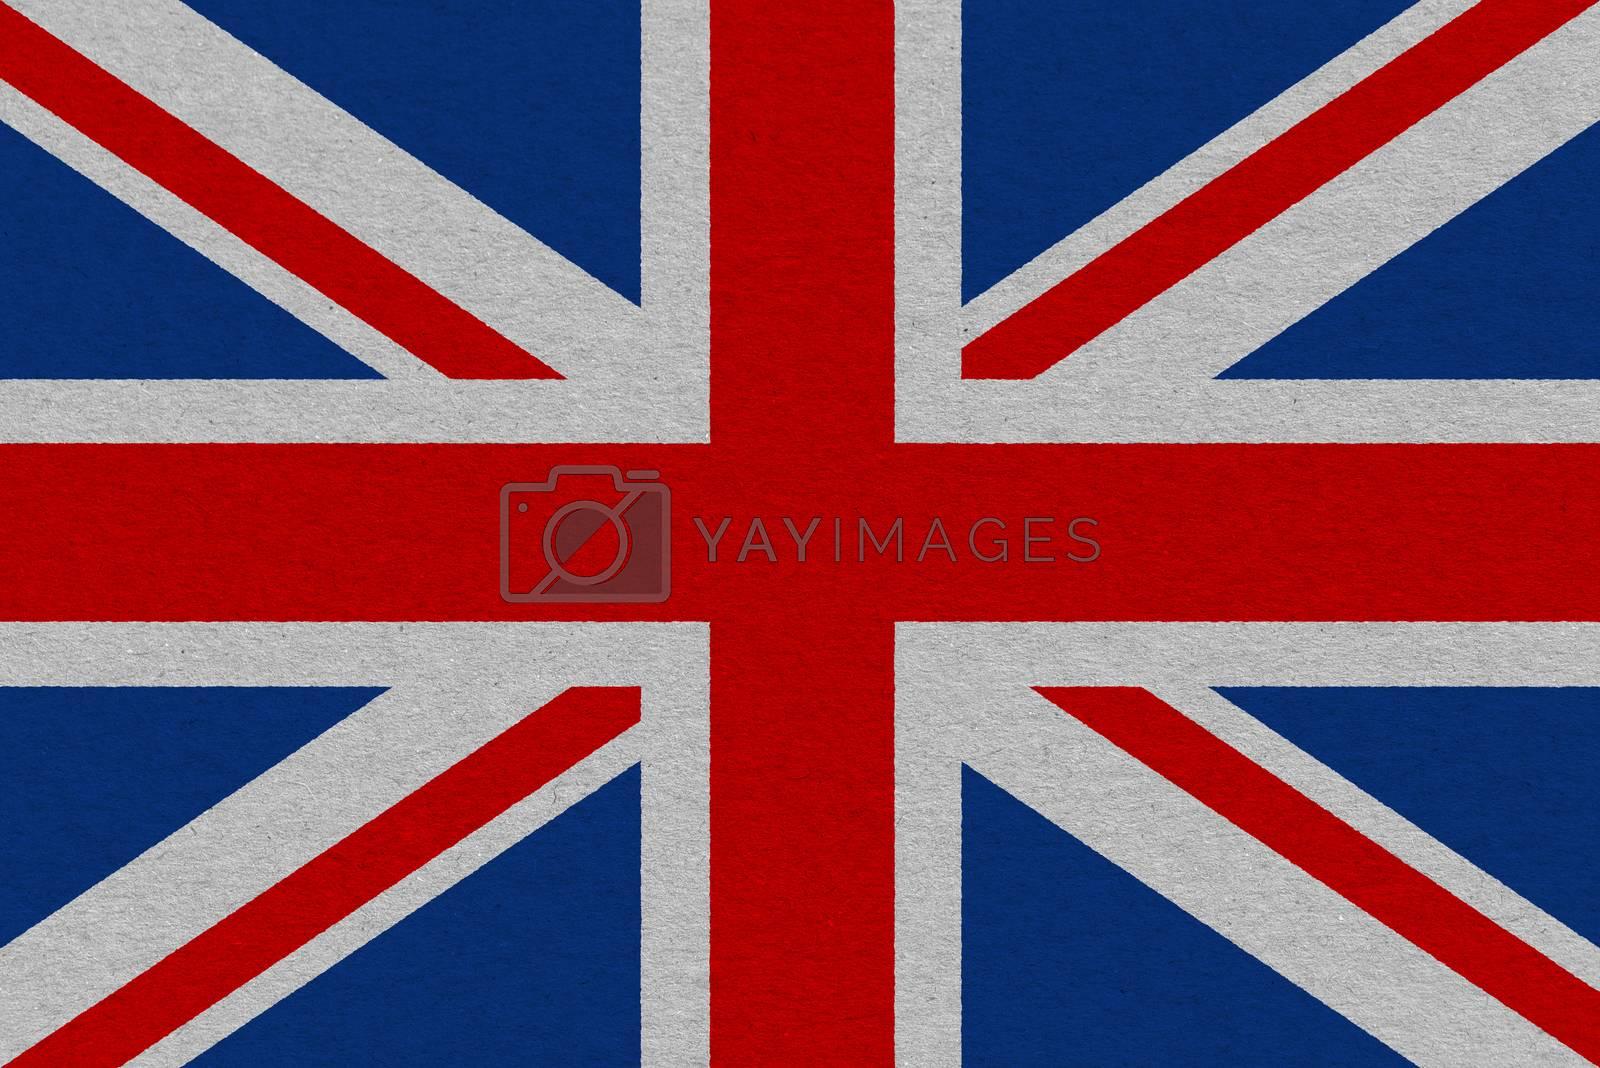 United Kingdom flag painted on paper. Patriotic background. National flag of United Kingdom